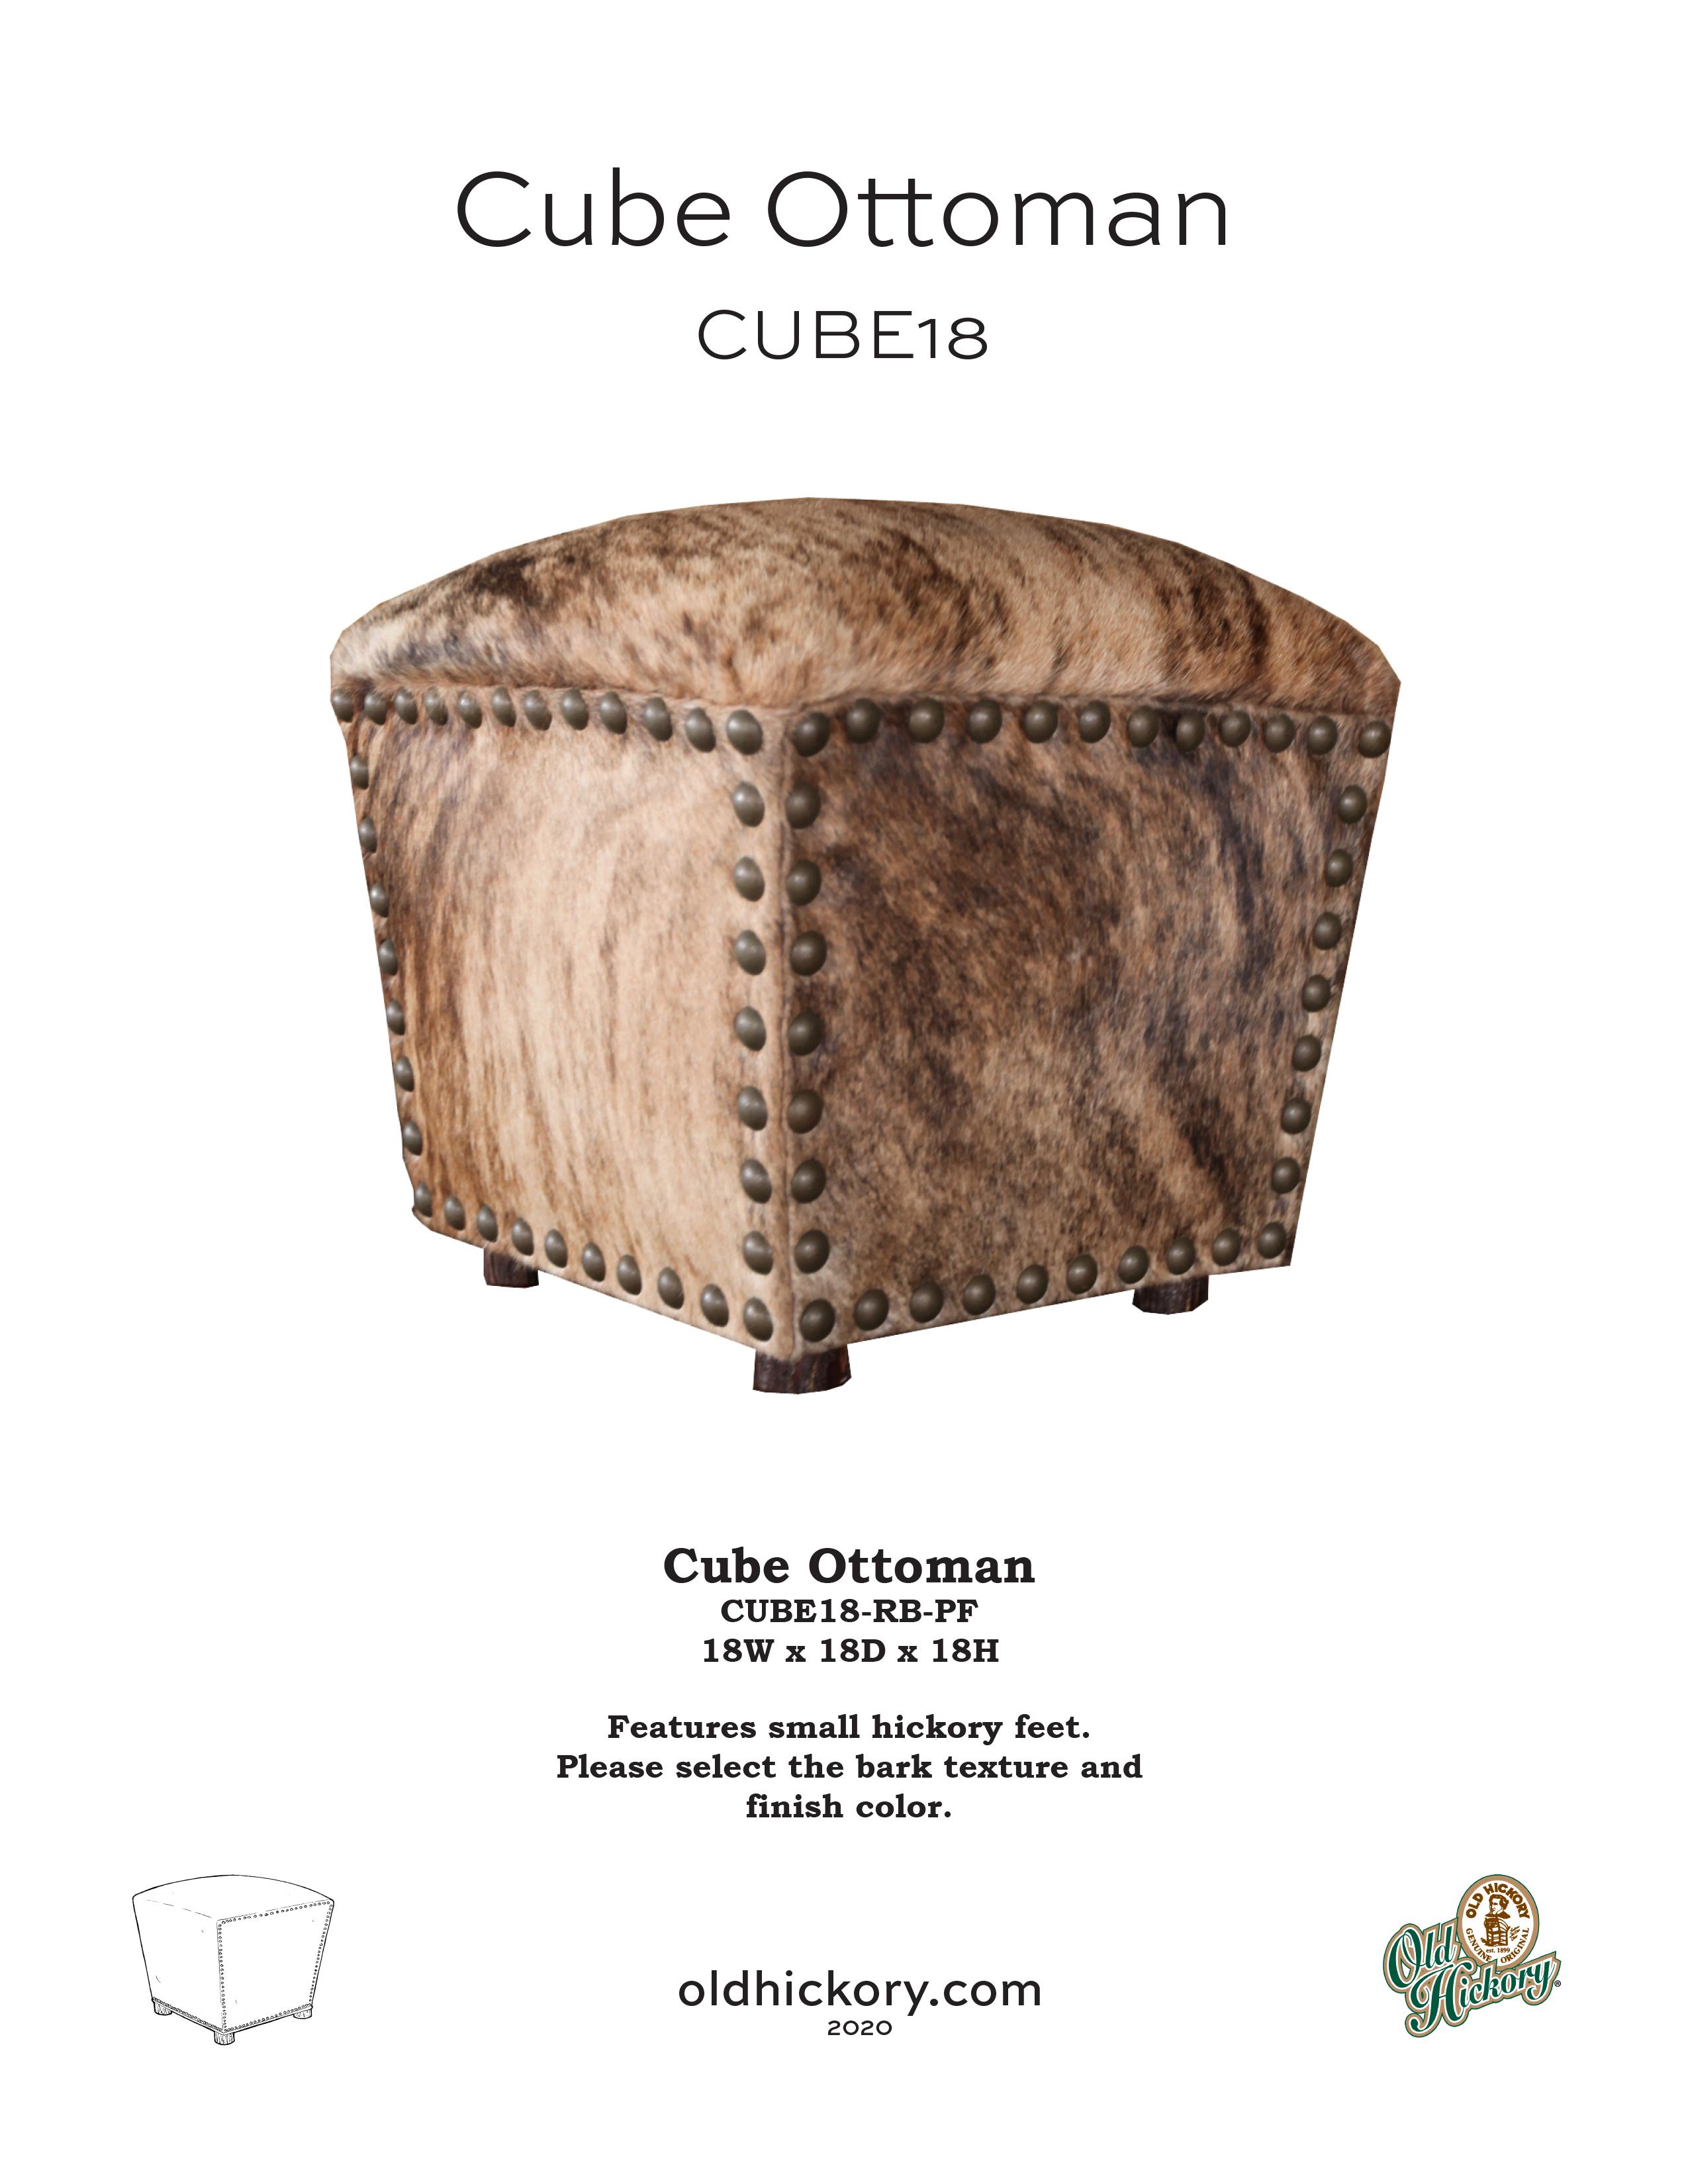 CUBE18